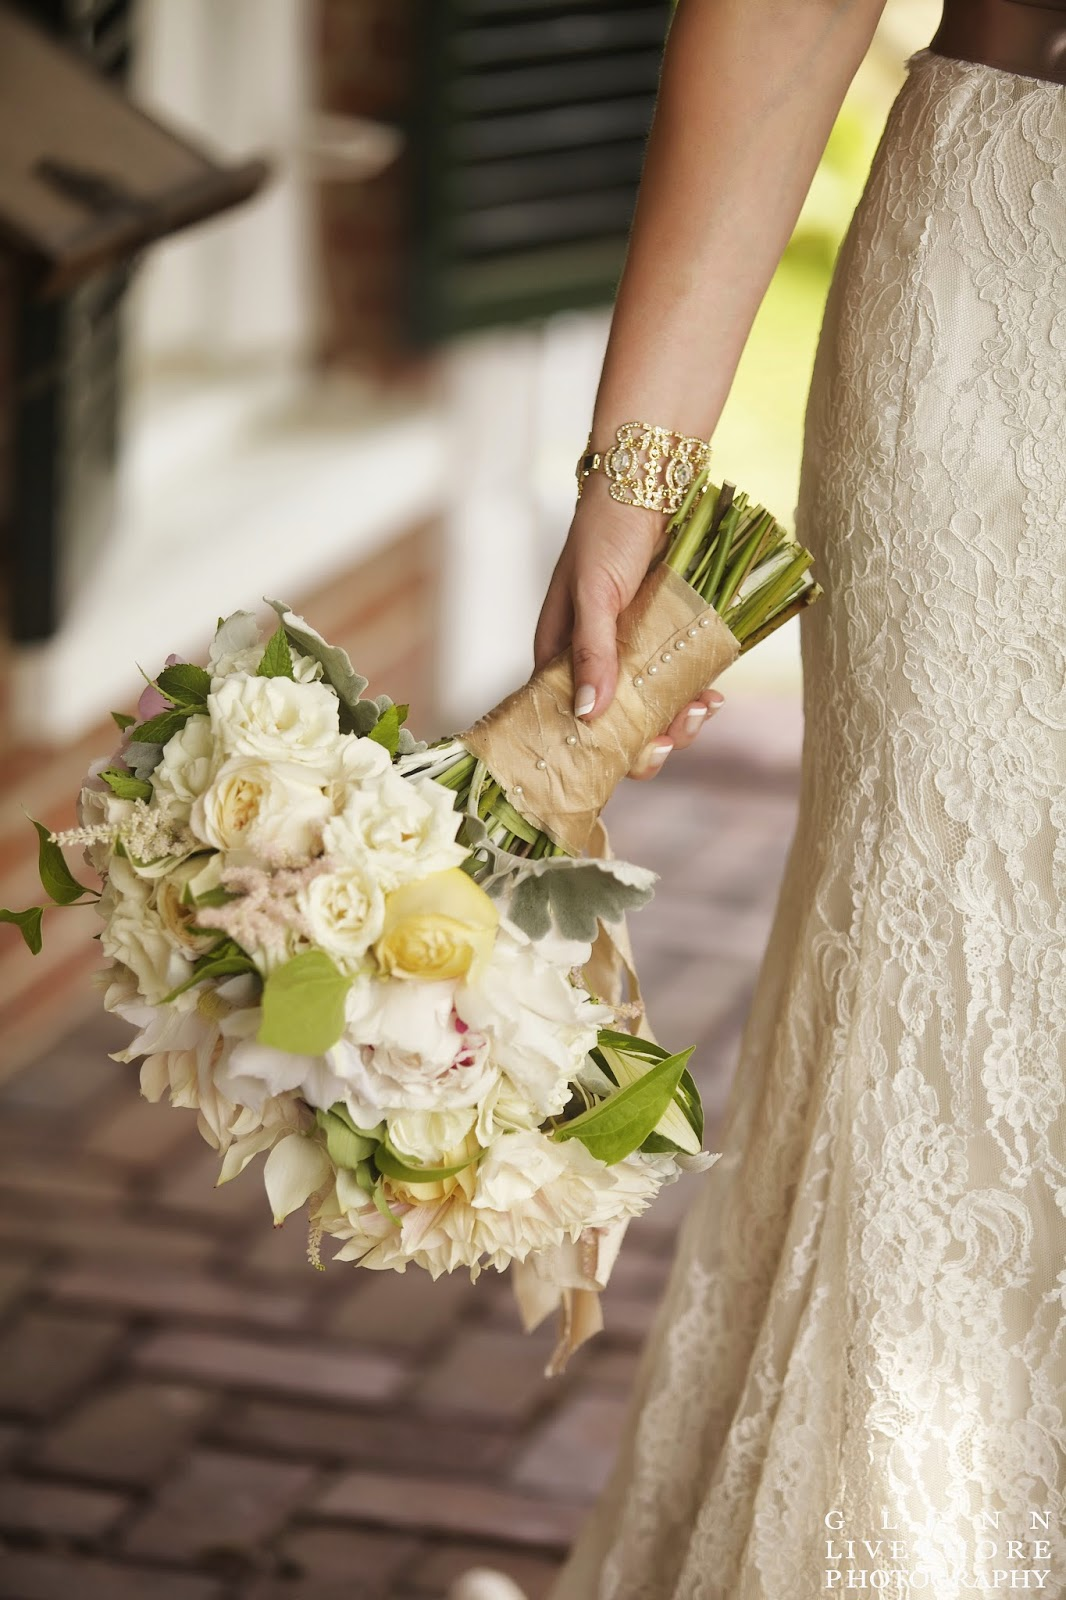 lace bridal gown : new england summer estate wedding : lanam club : glenn livermore photography : les fleurs : ivory & champagne : peony, garden rose & dahlia